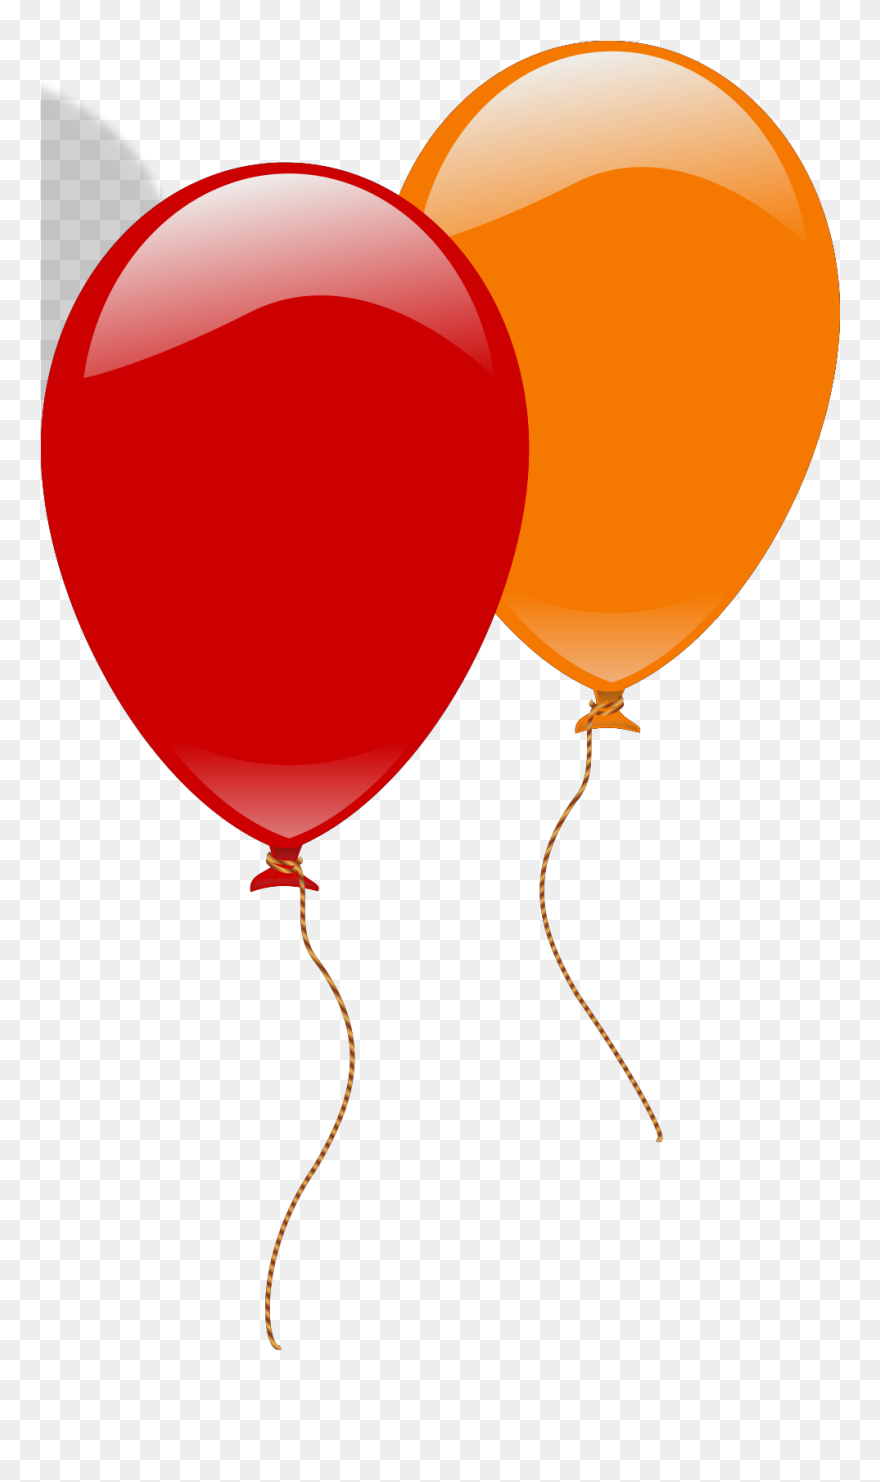 Balloons orange. Big image and red